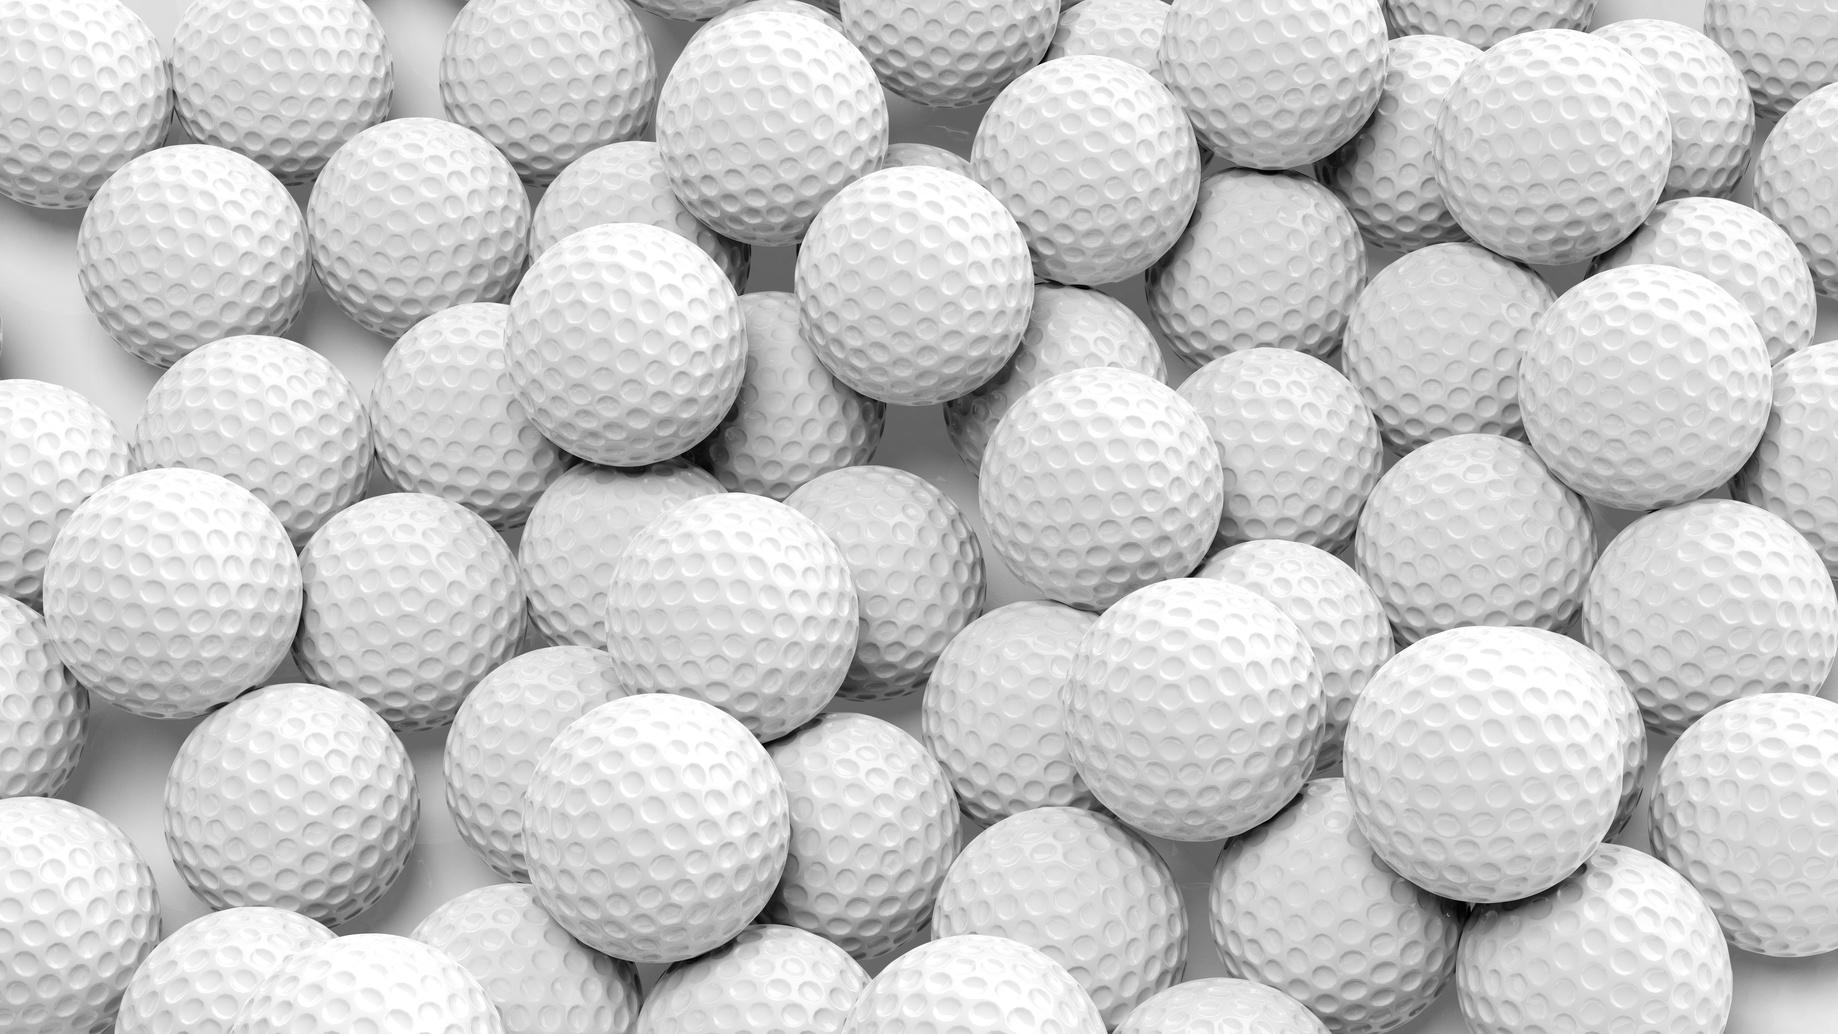 Andbank_banca_privada_pelotas_golf